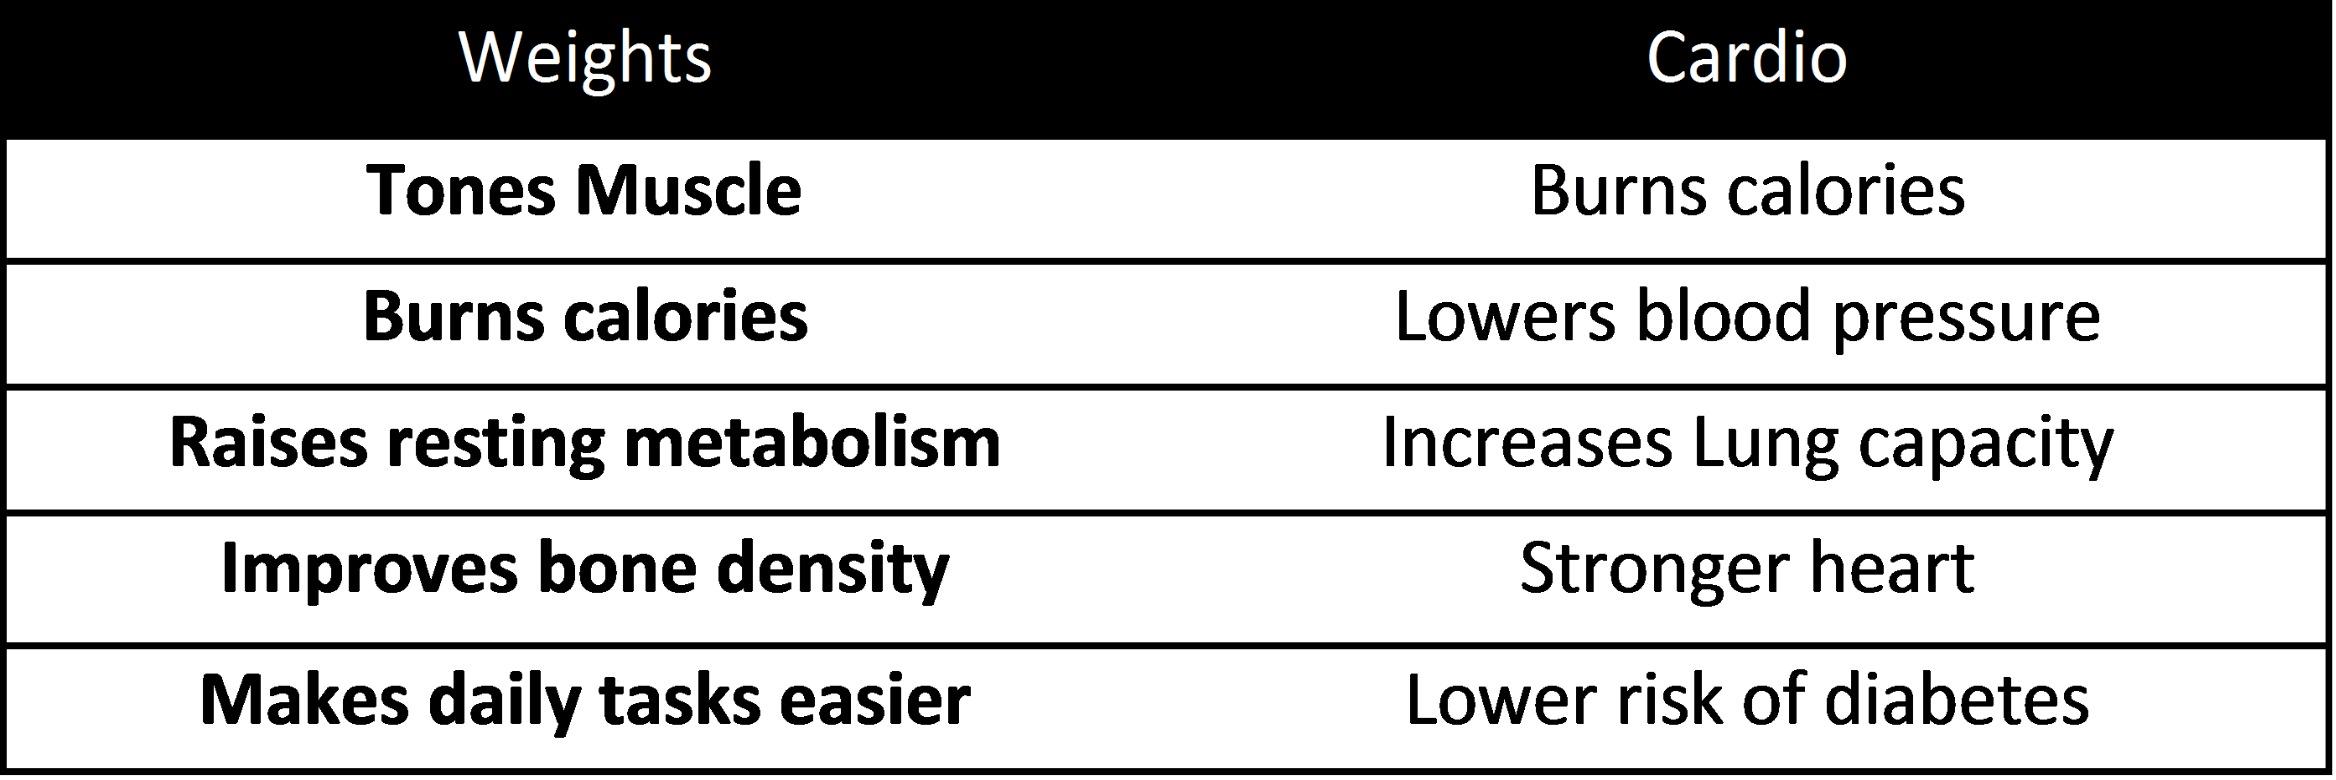 weights-vs-cardio